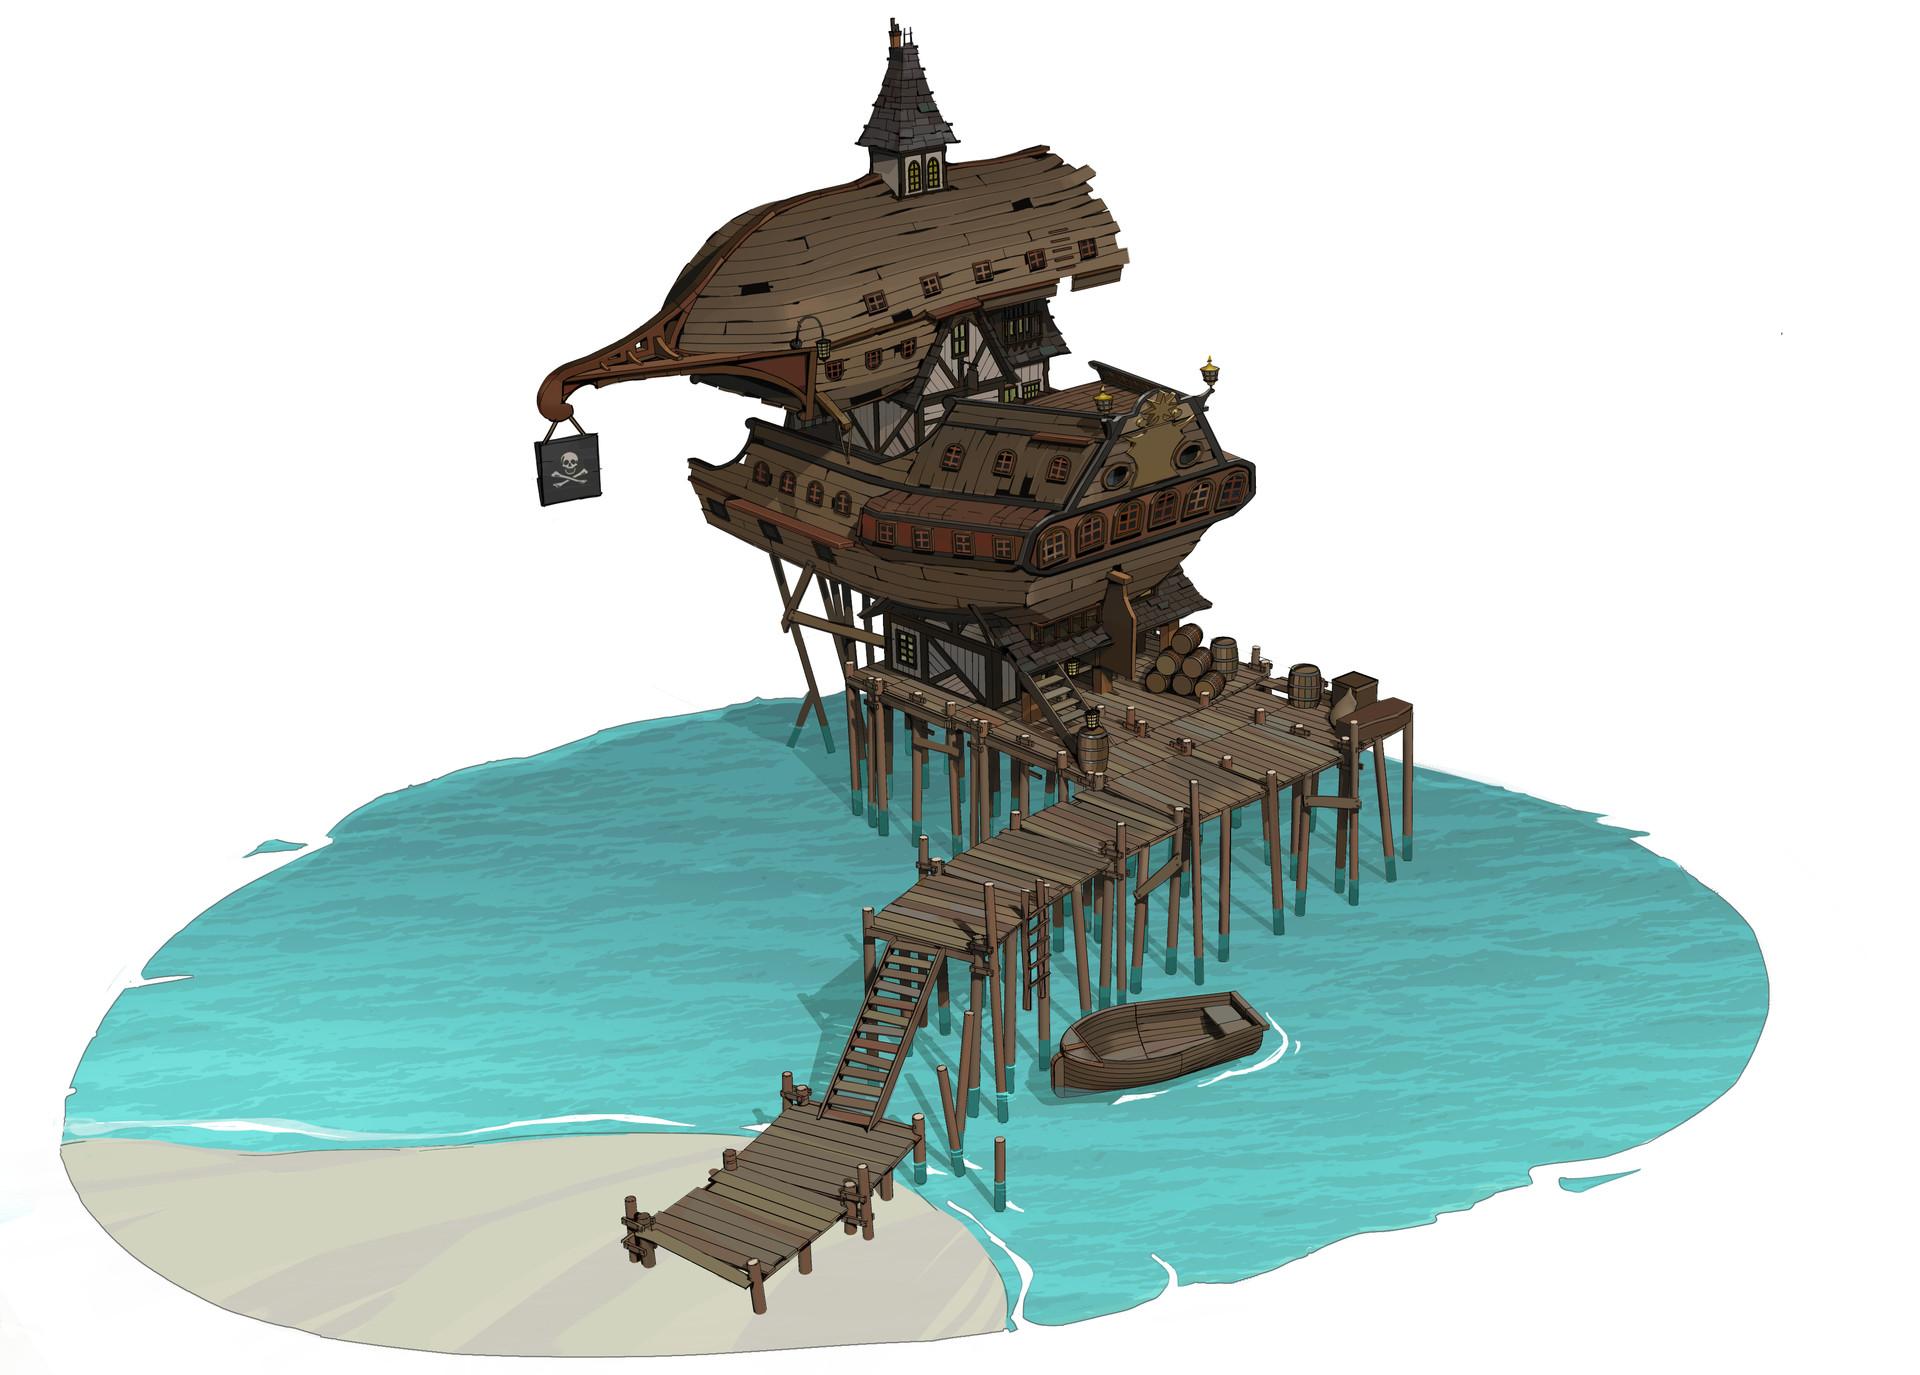 Brian Matyas Pirate Architecture Designs